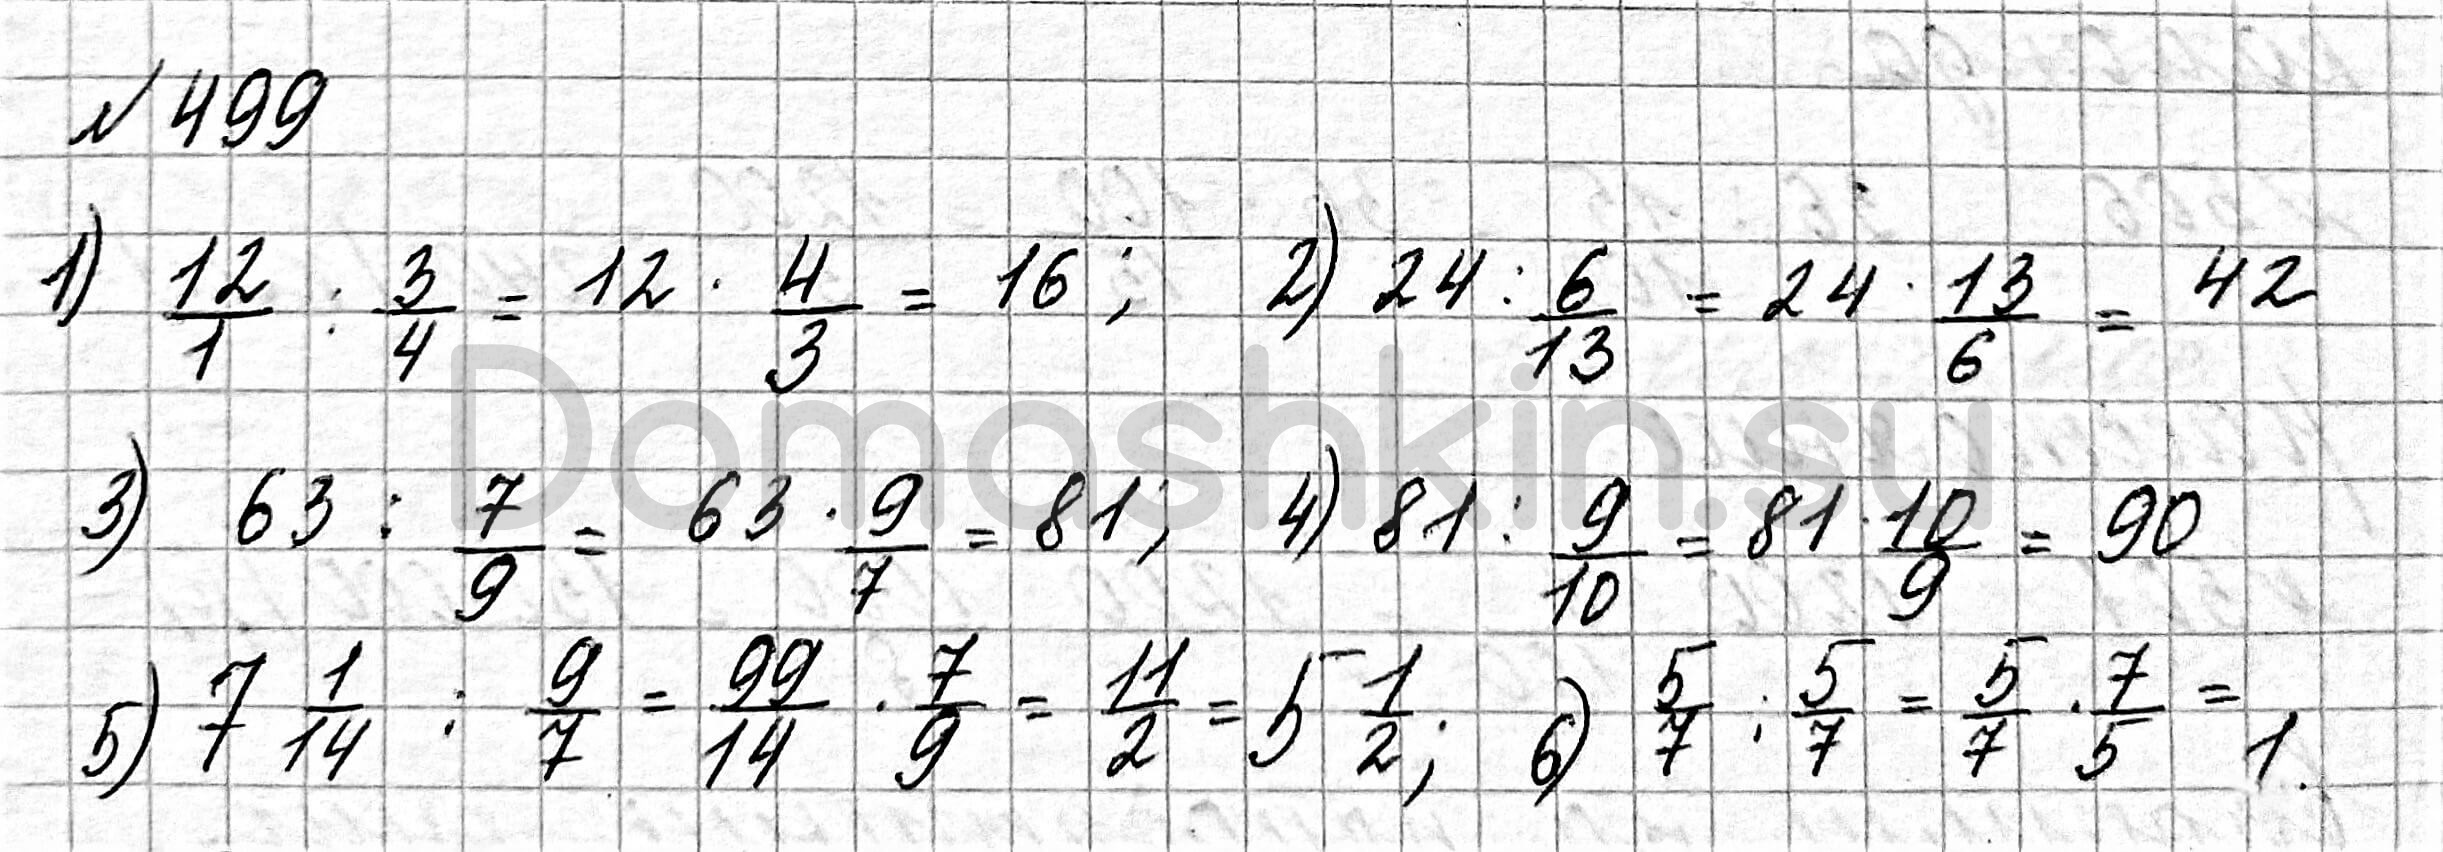 Математика 6 класс учебник Мерзляк номер 499 решение